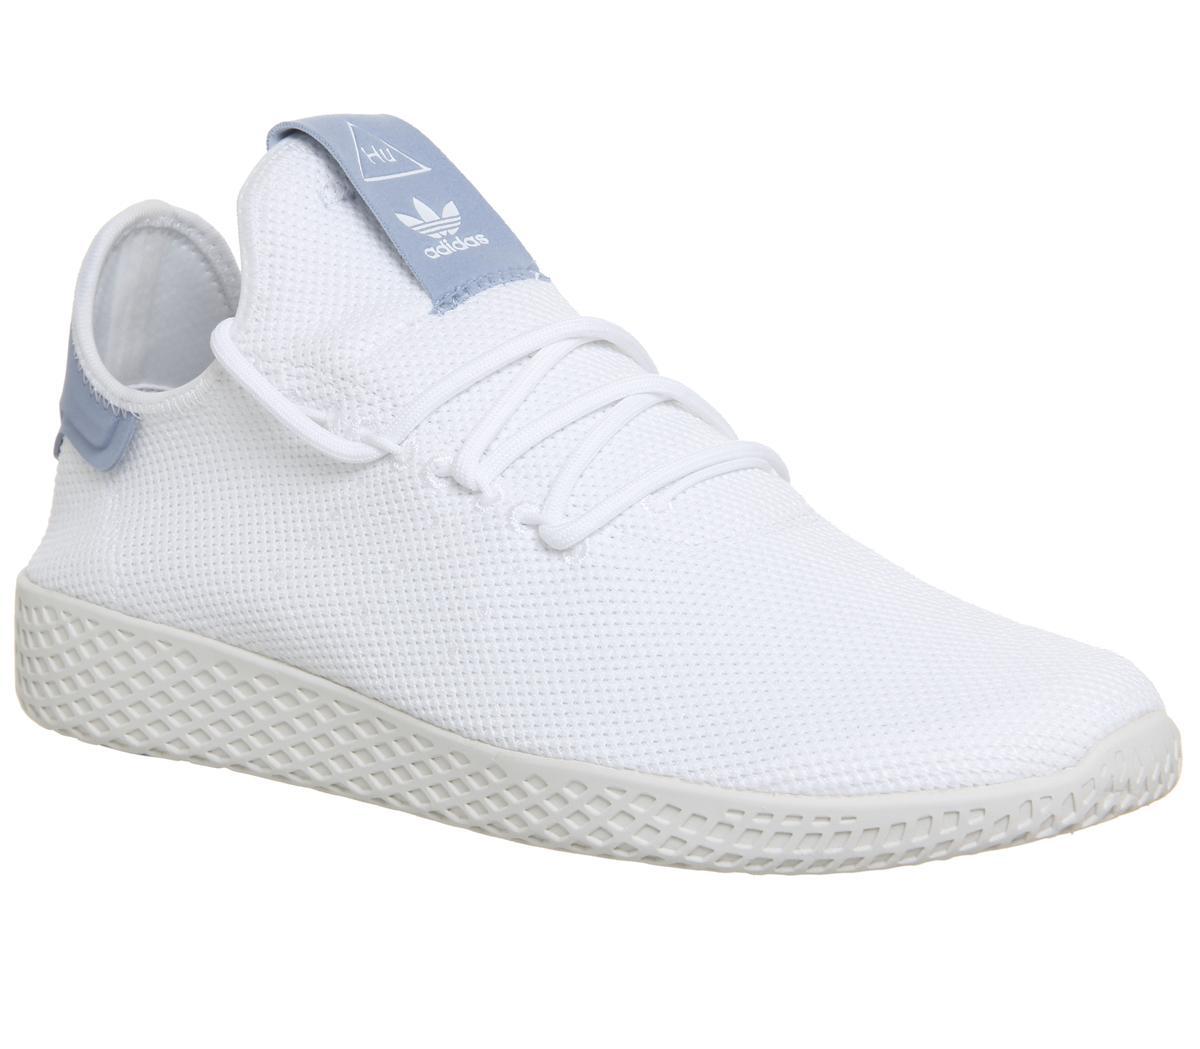 Adidas Sportschuhe Pw Hu Blue White Tennis Unisex HEeD9IYW2